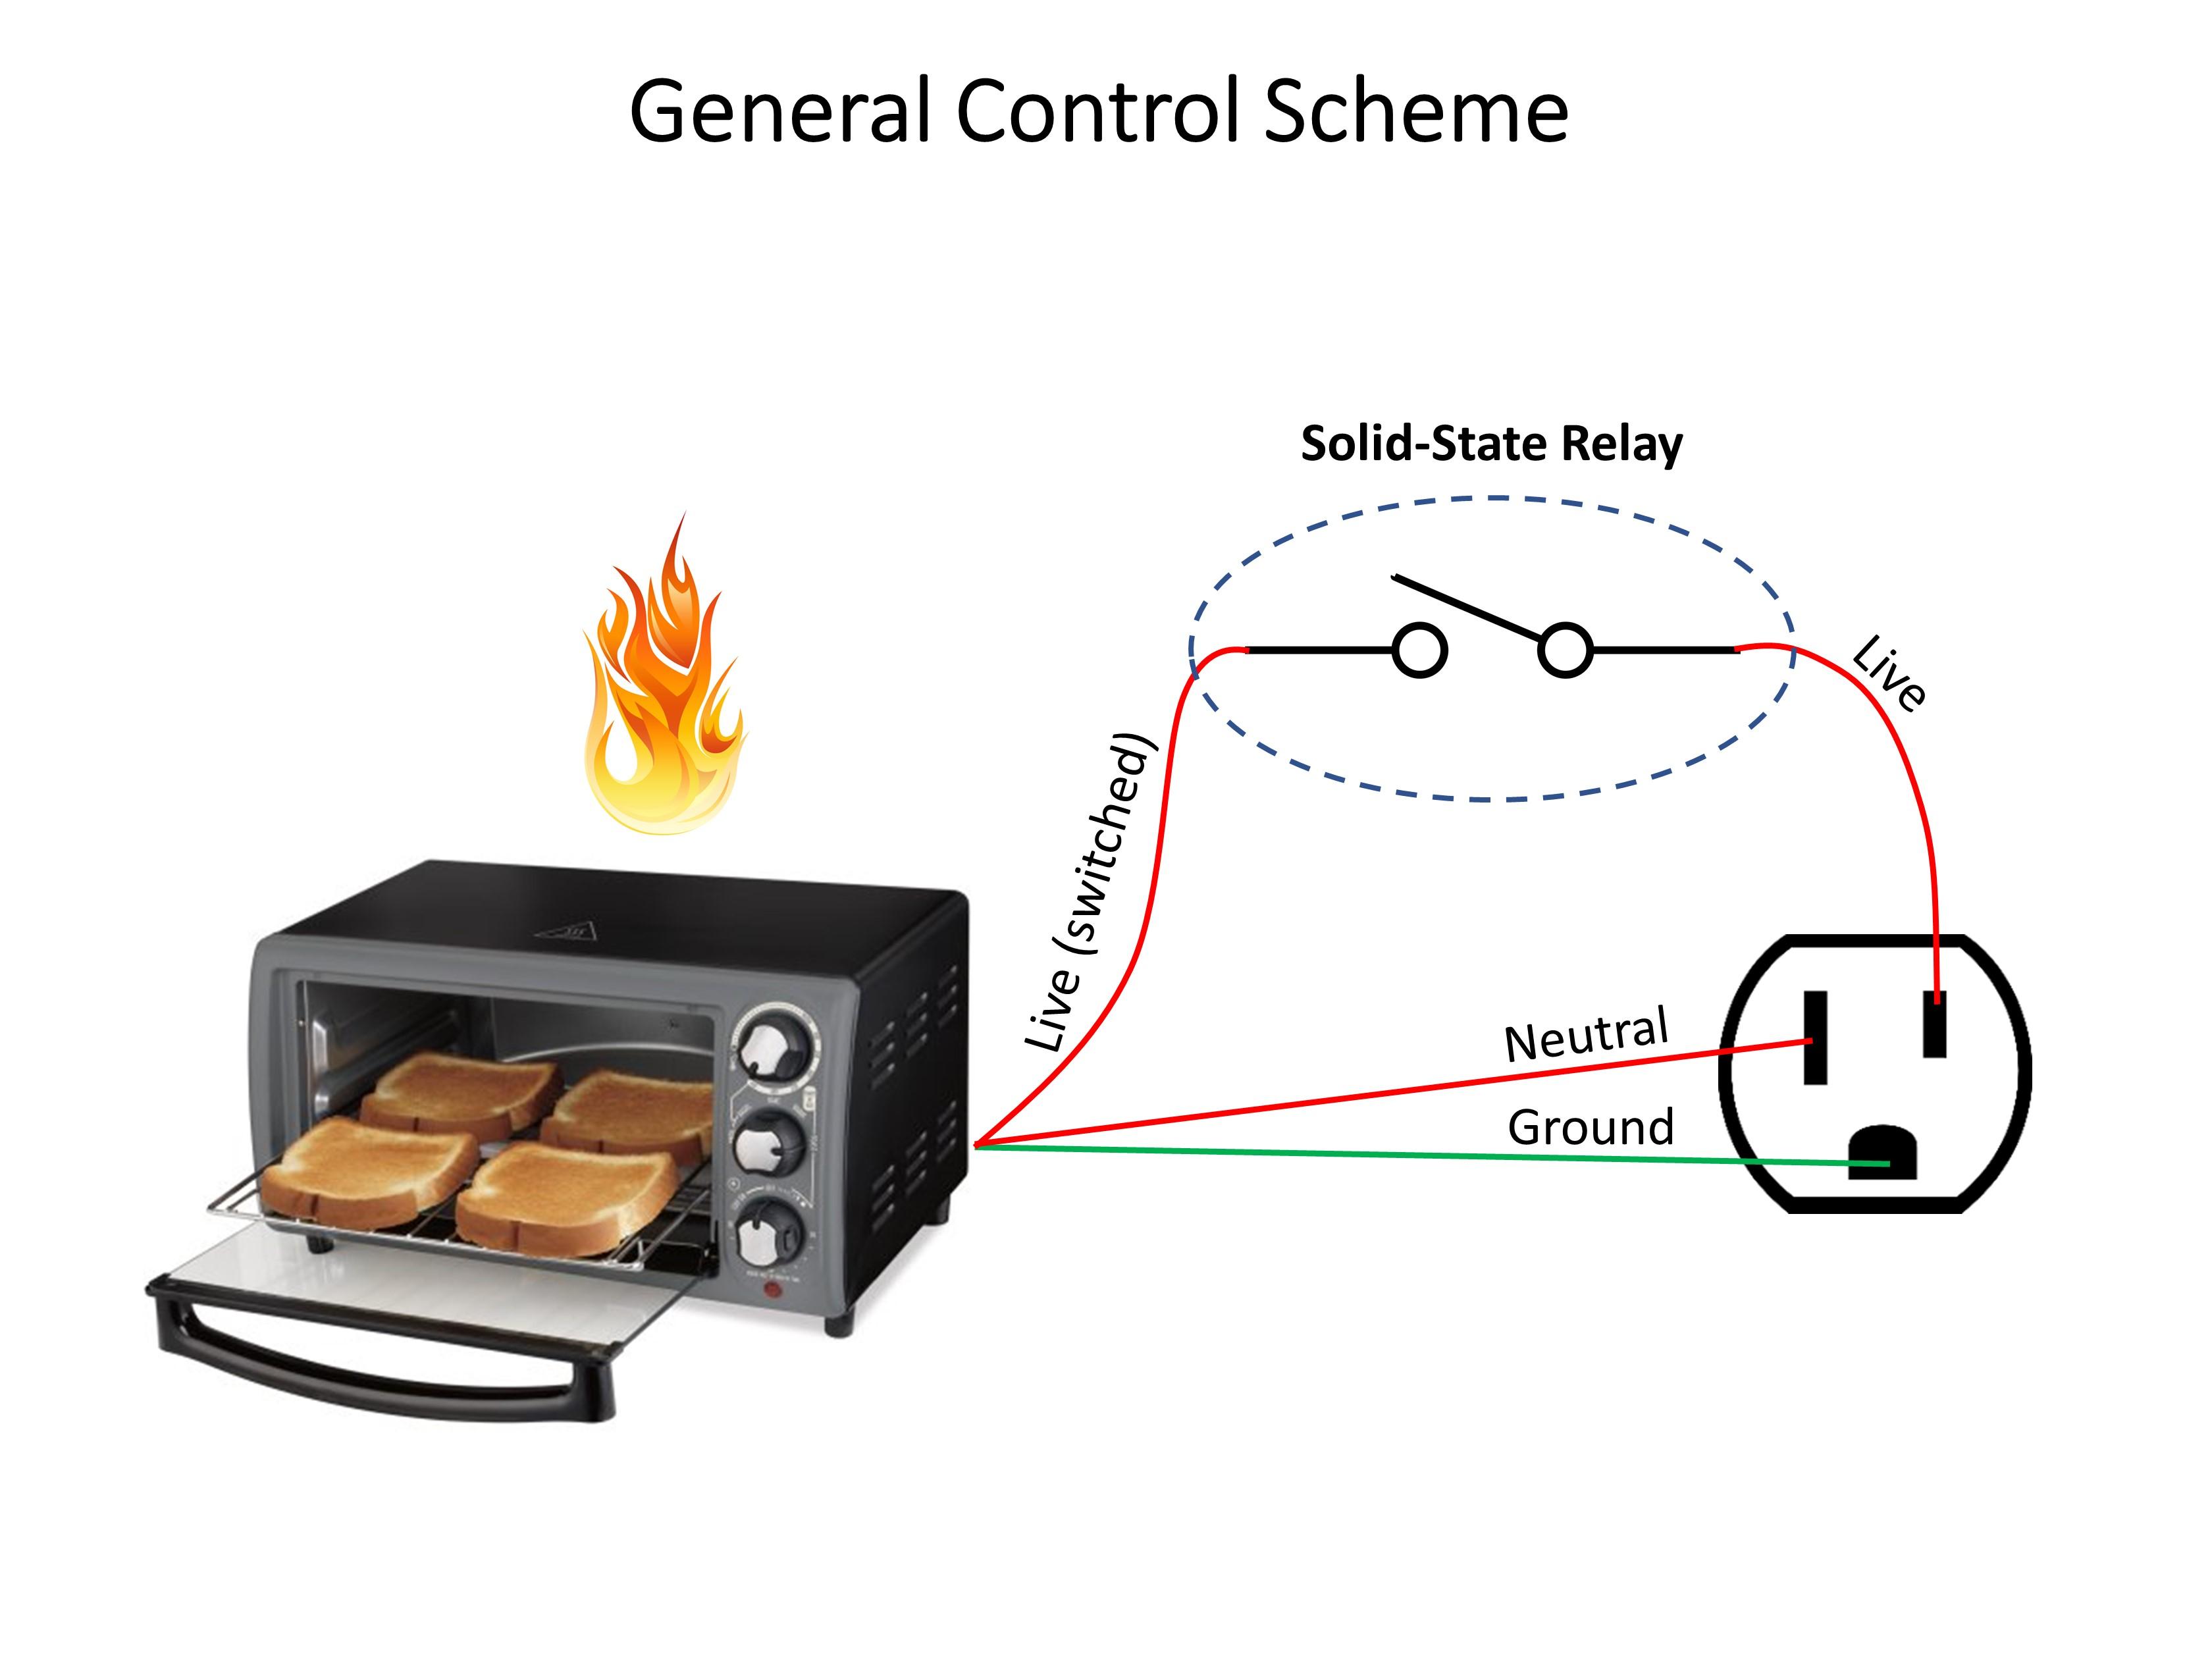 esp32 bluetooth reflow oven hackster iotoaster oven wiring diagram 15 [ 3360 x 2520 Pixel ]